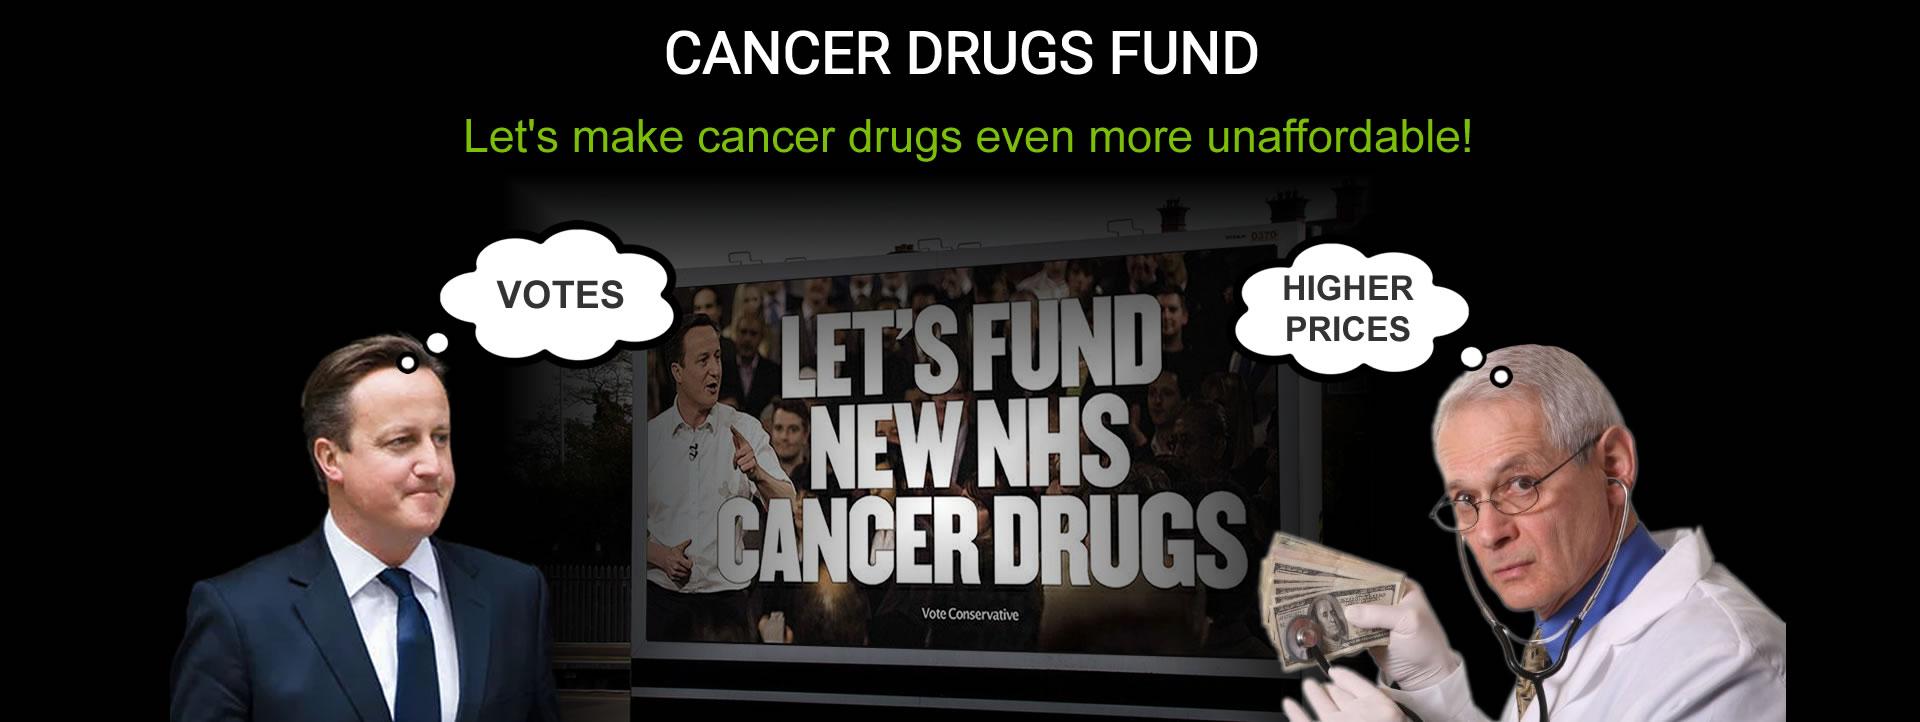 Cancer Drugs Fund Fuels Price Rises